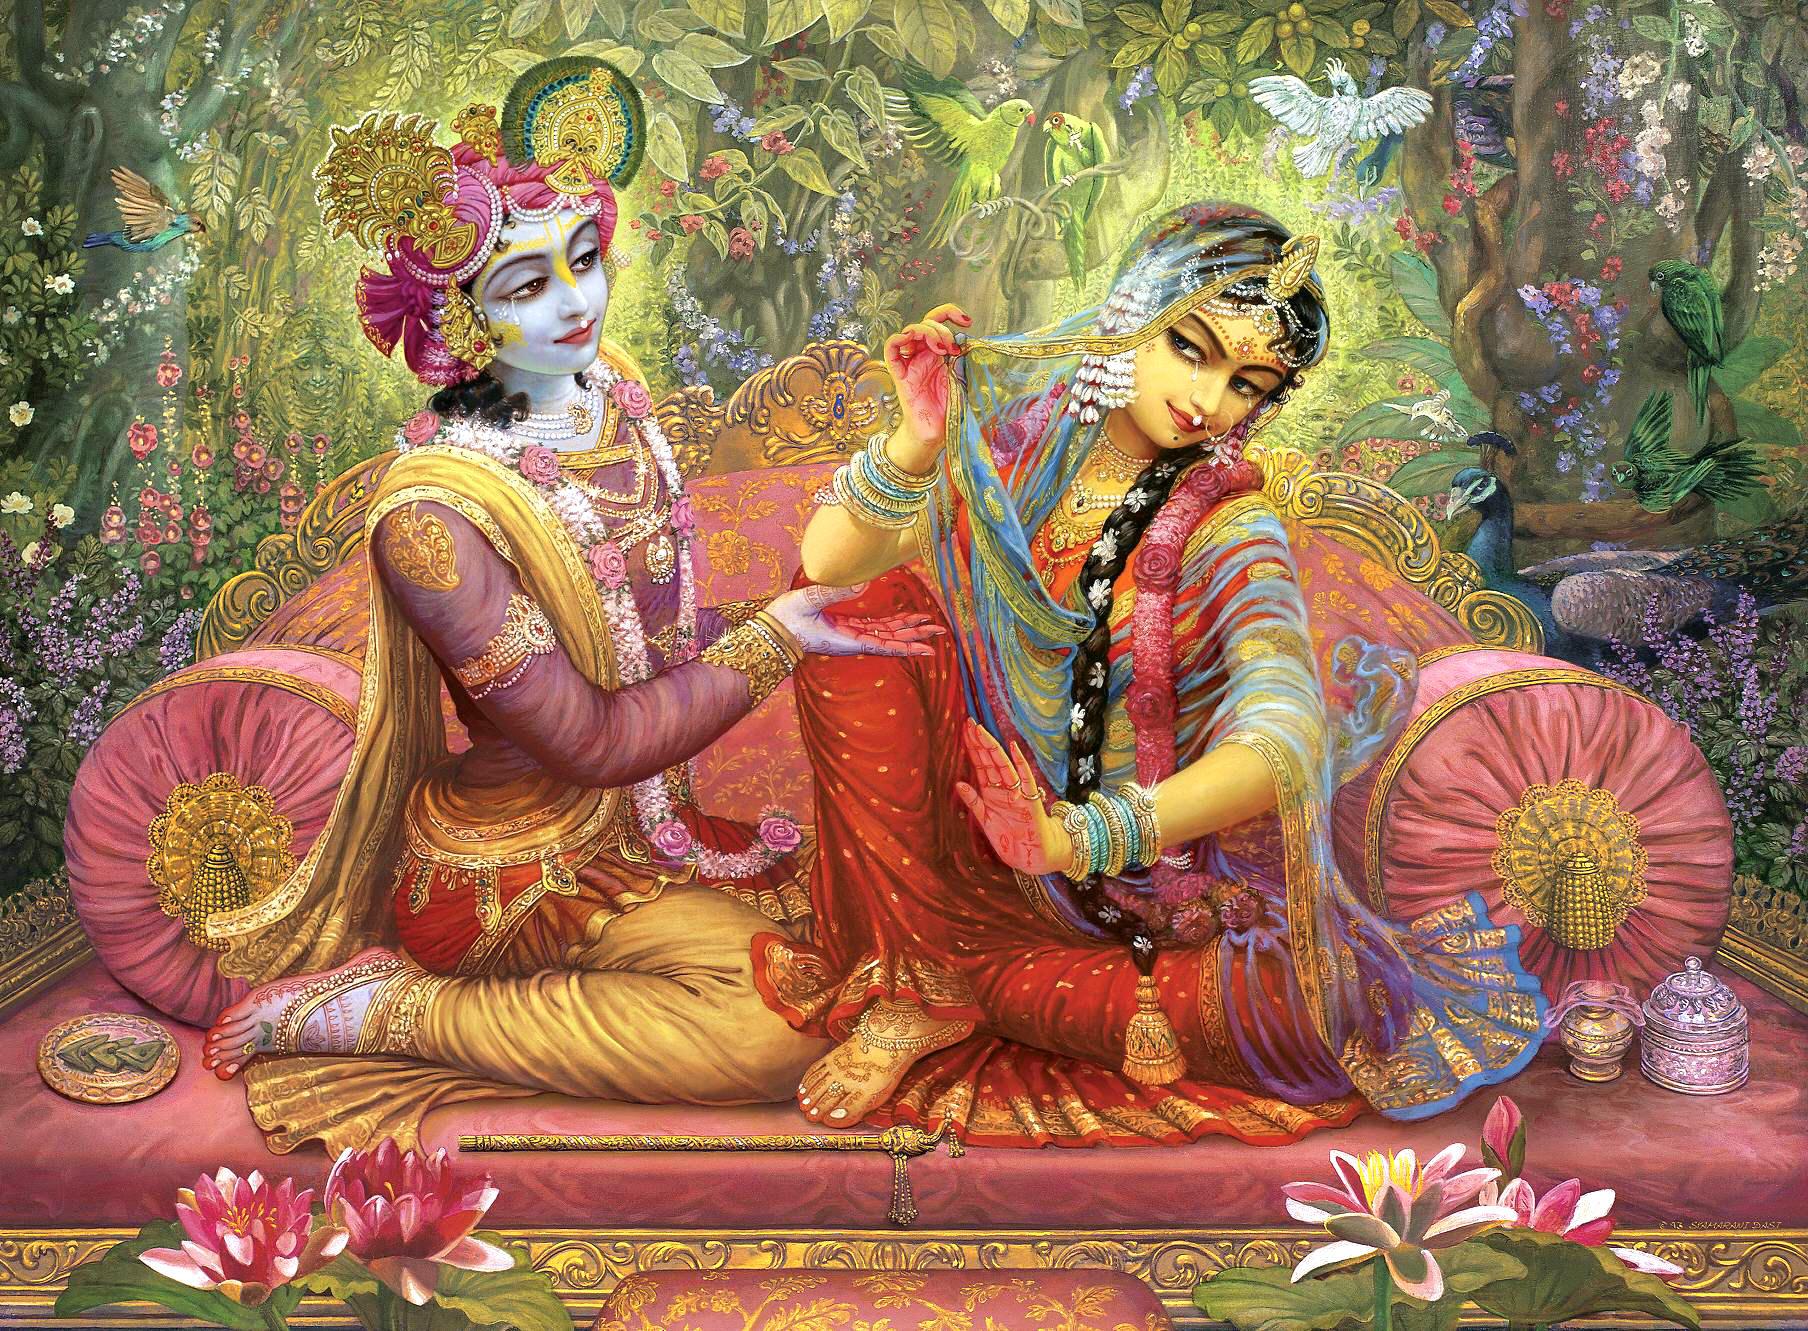 High quality print of sri sri radha and krishna together sitting on